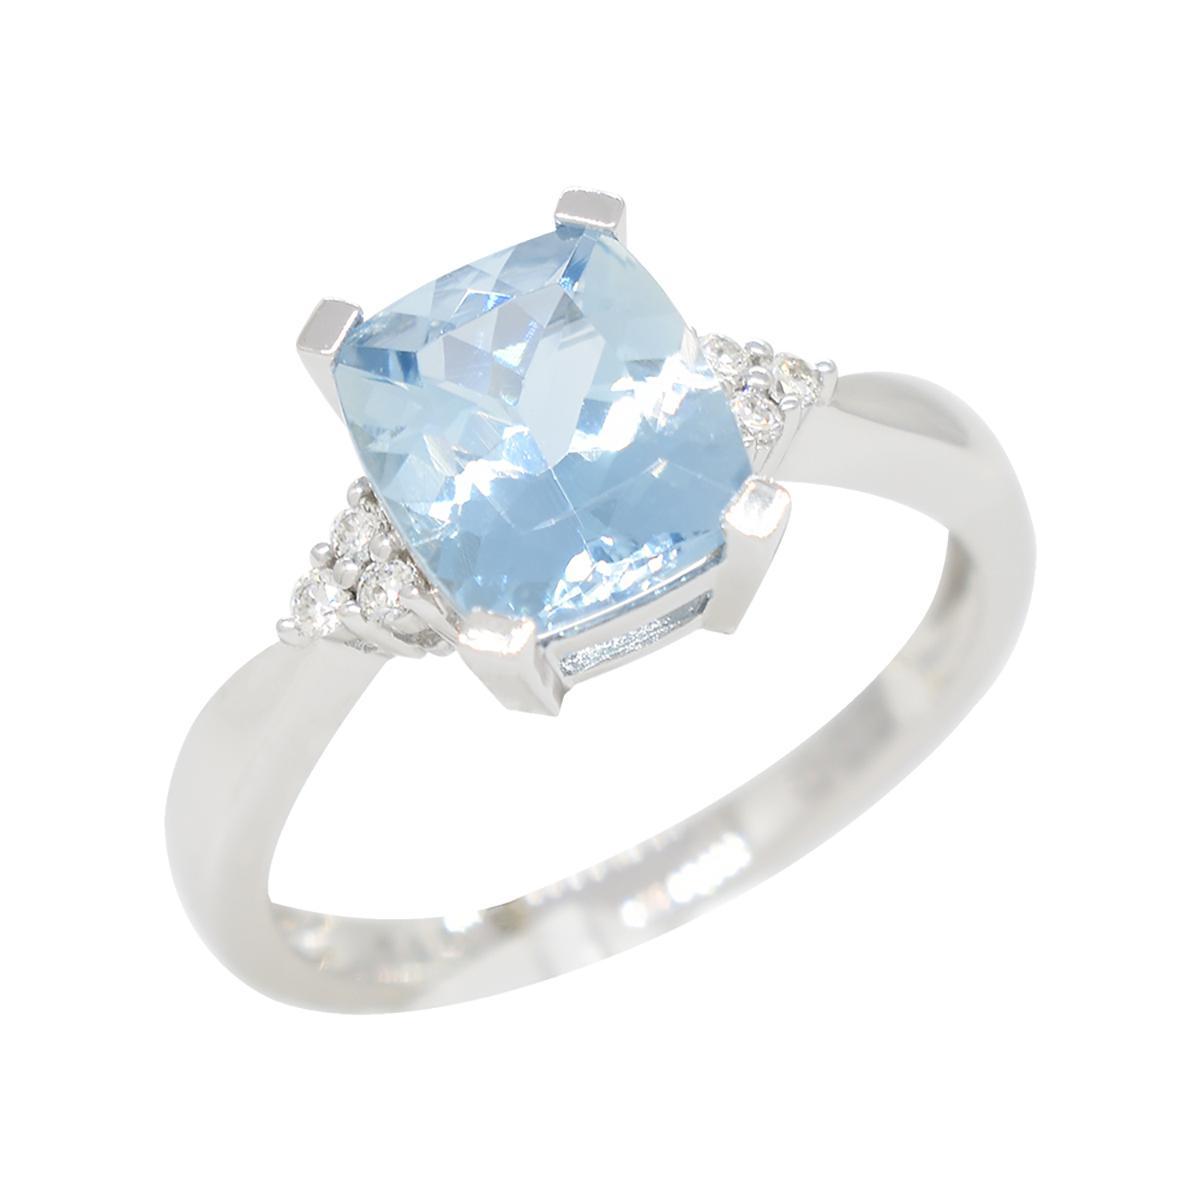 diamond-and-aquamarine-ring-with-stunning-blue-color-cushion-cut-aquamarine